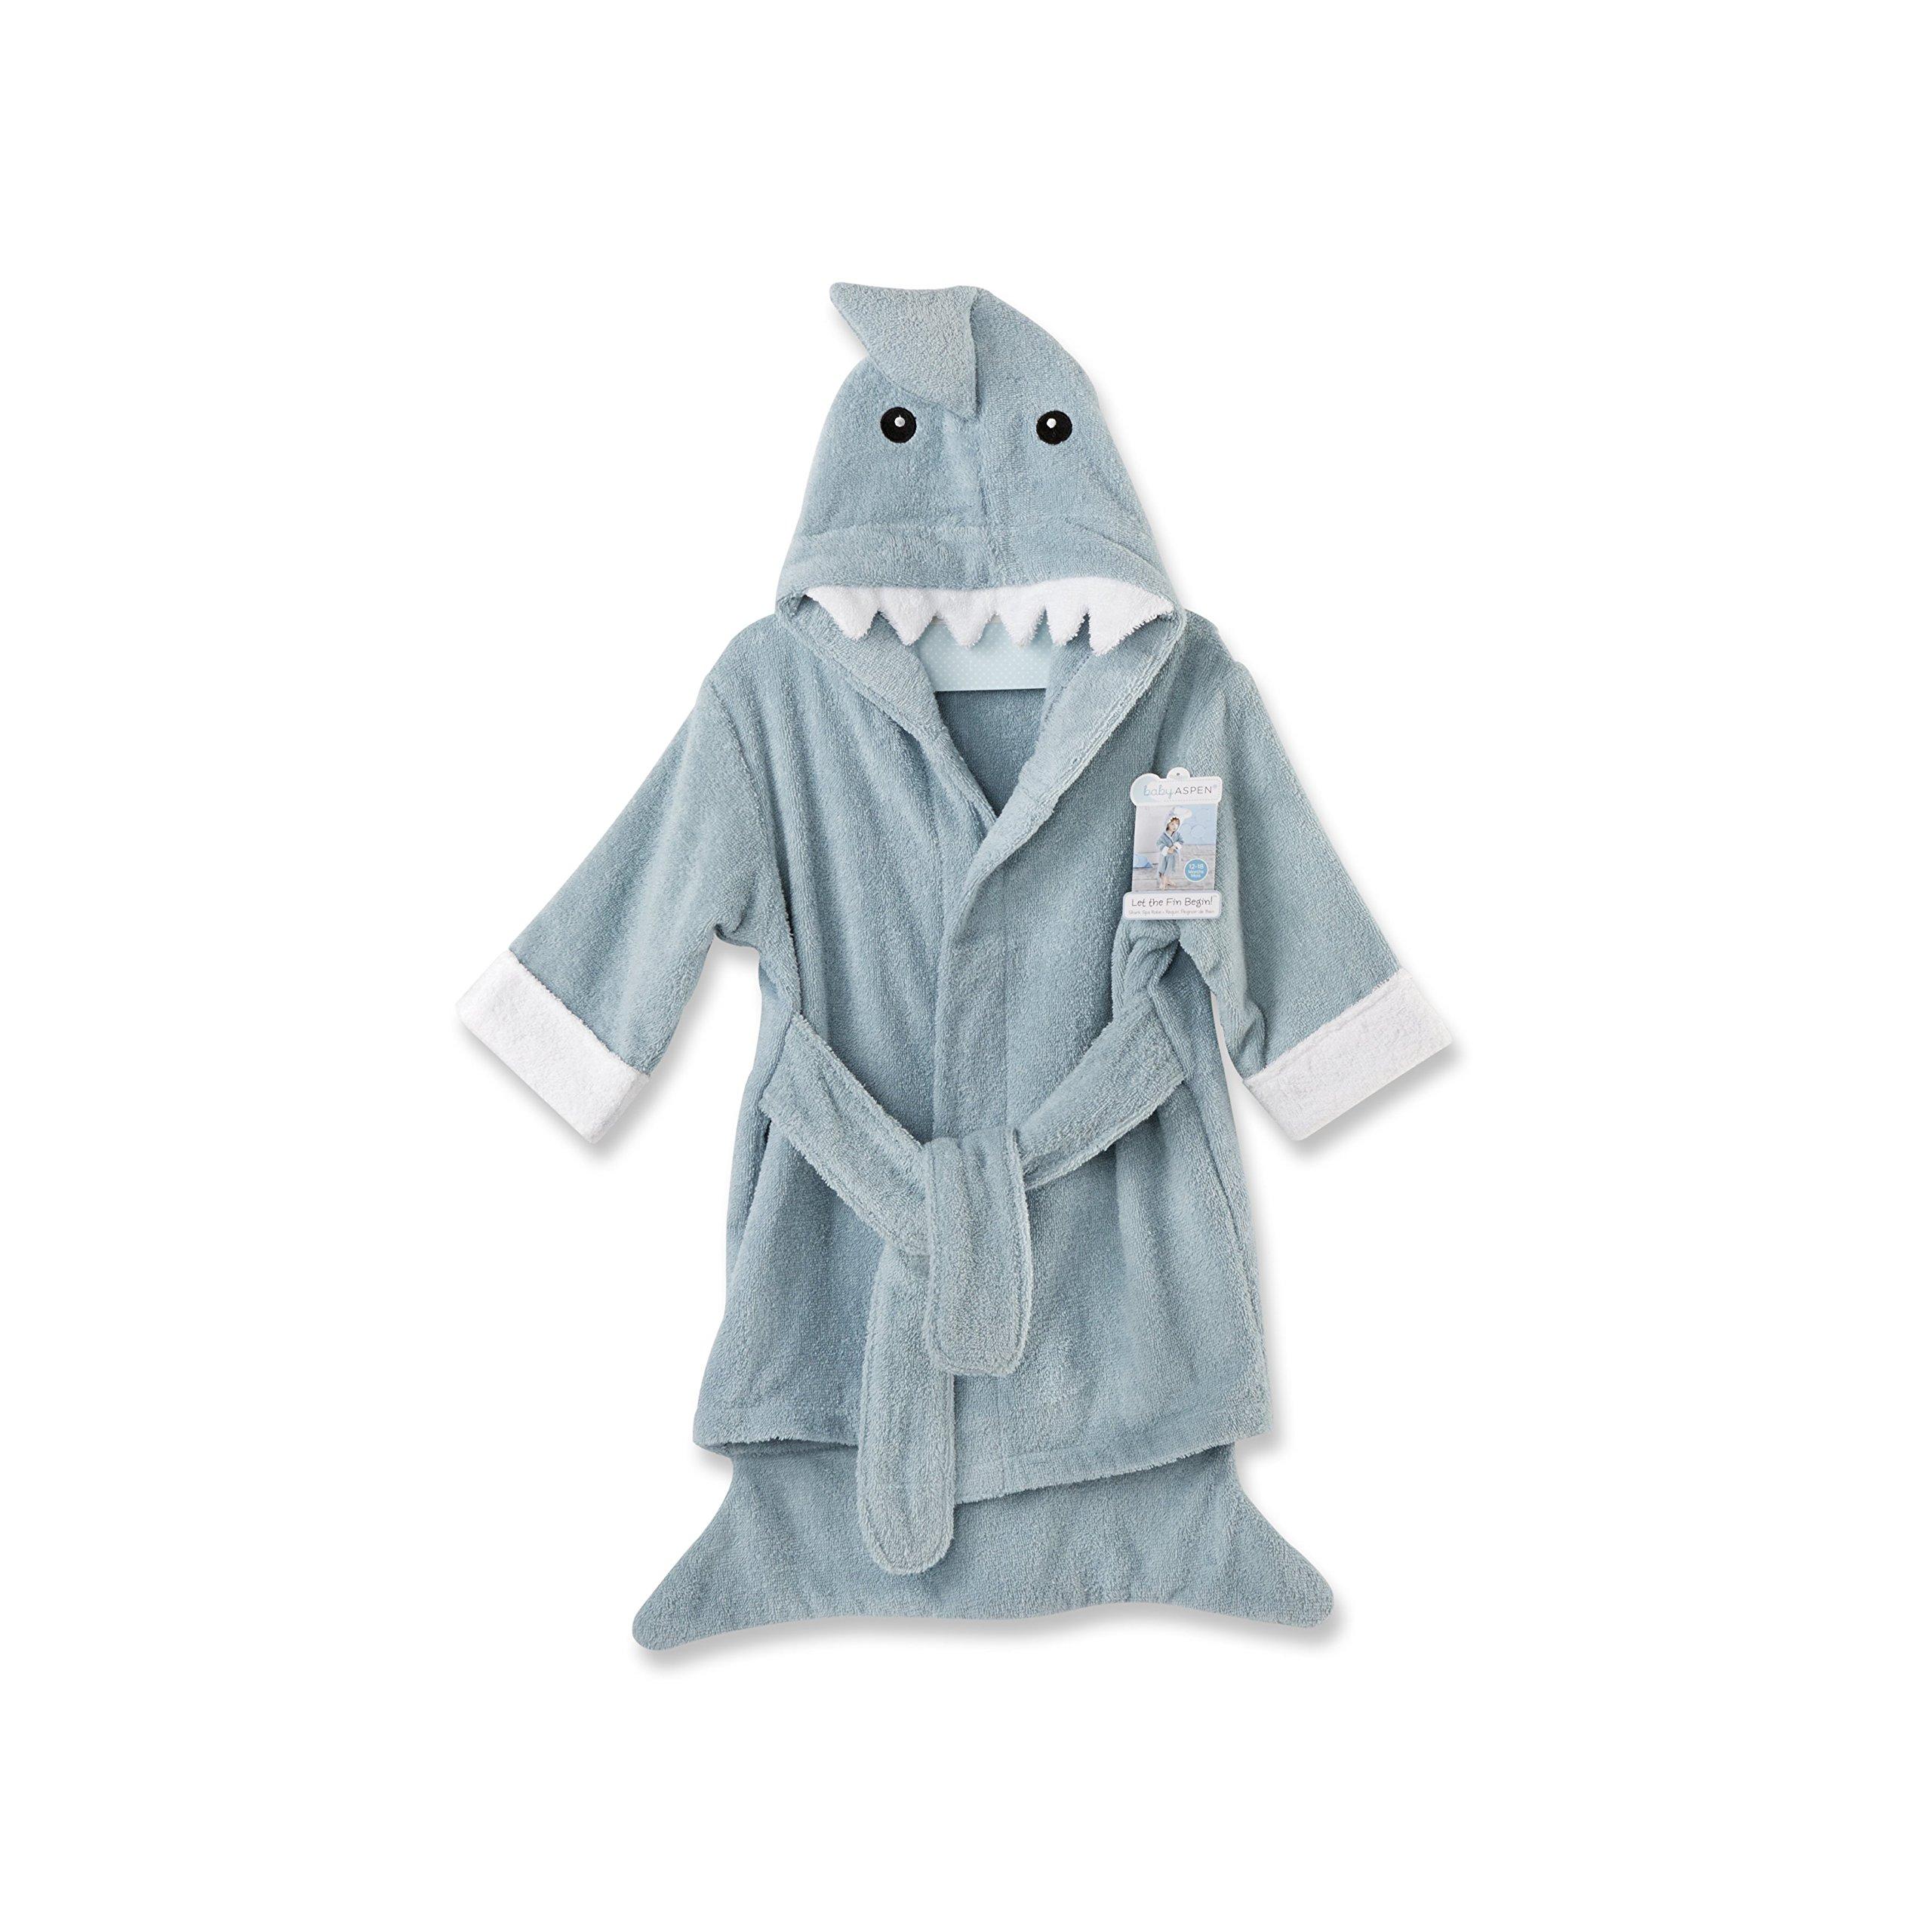 Baby Aspen Let The Fun Begin Blue Shark Robe, Blue, 12-18 Months by Baby Aspen